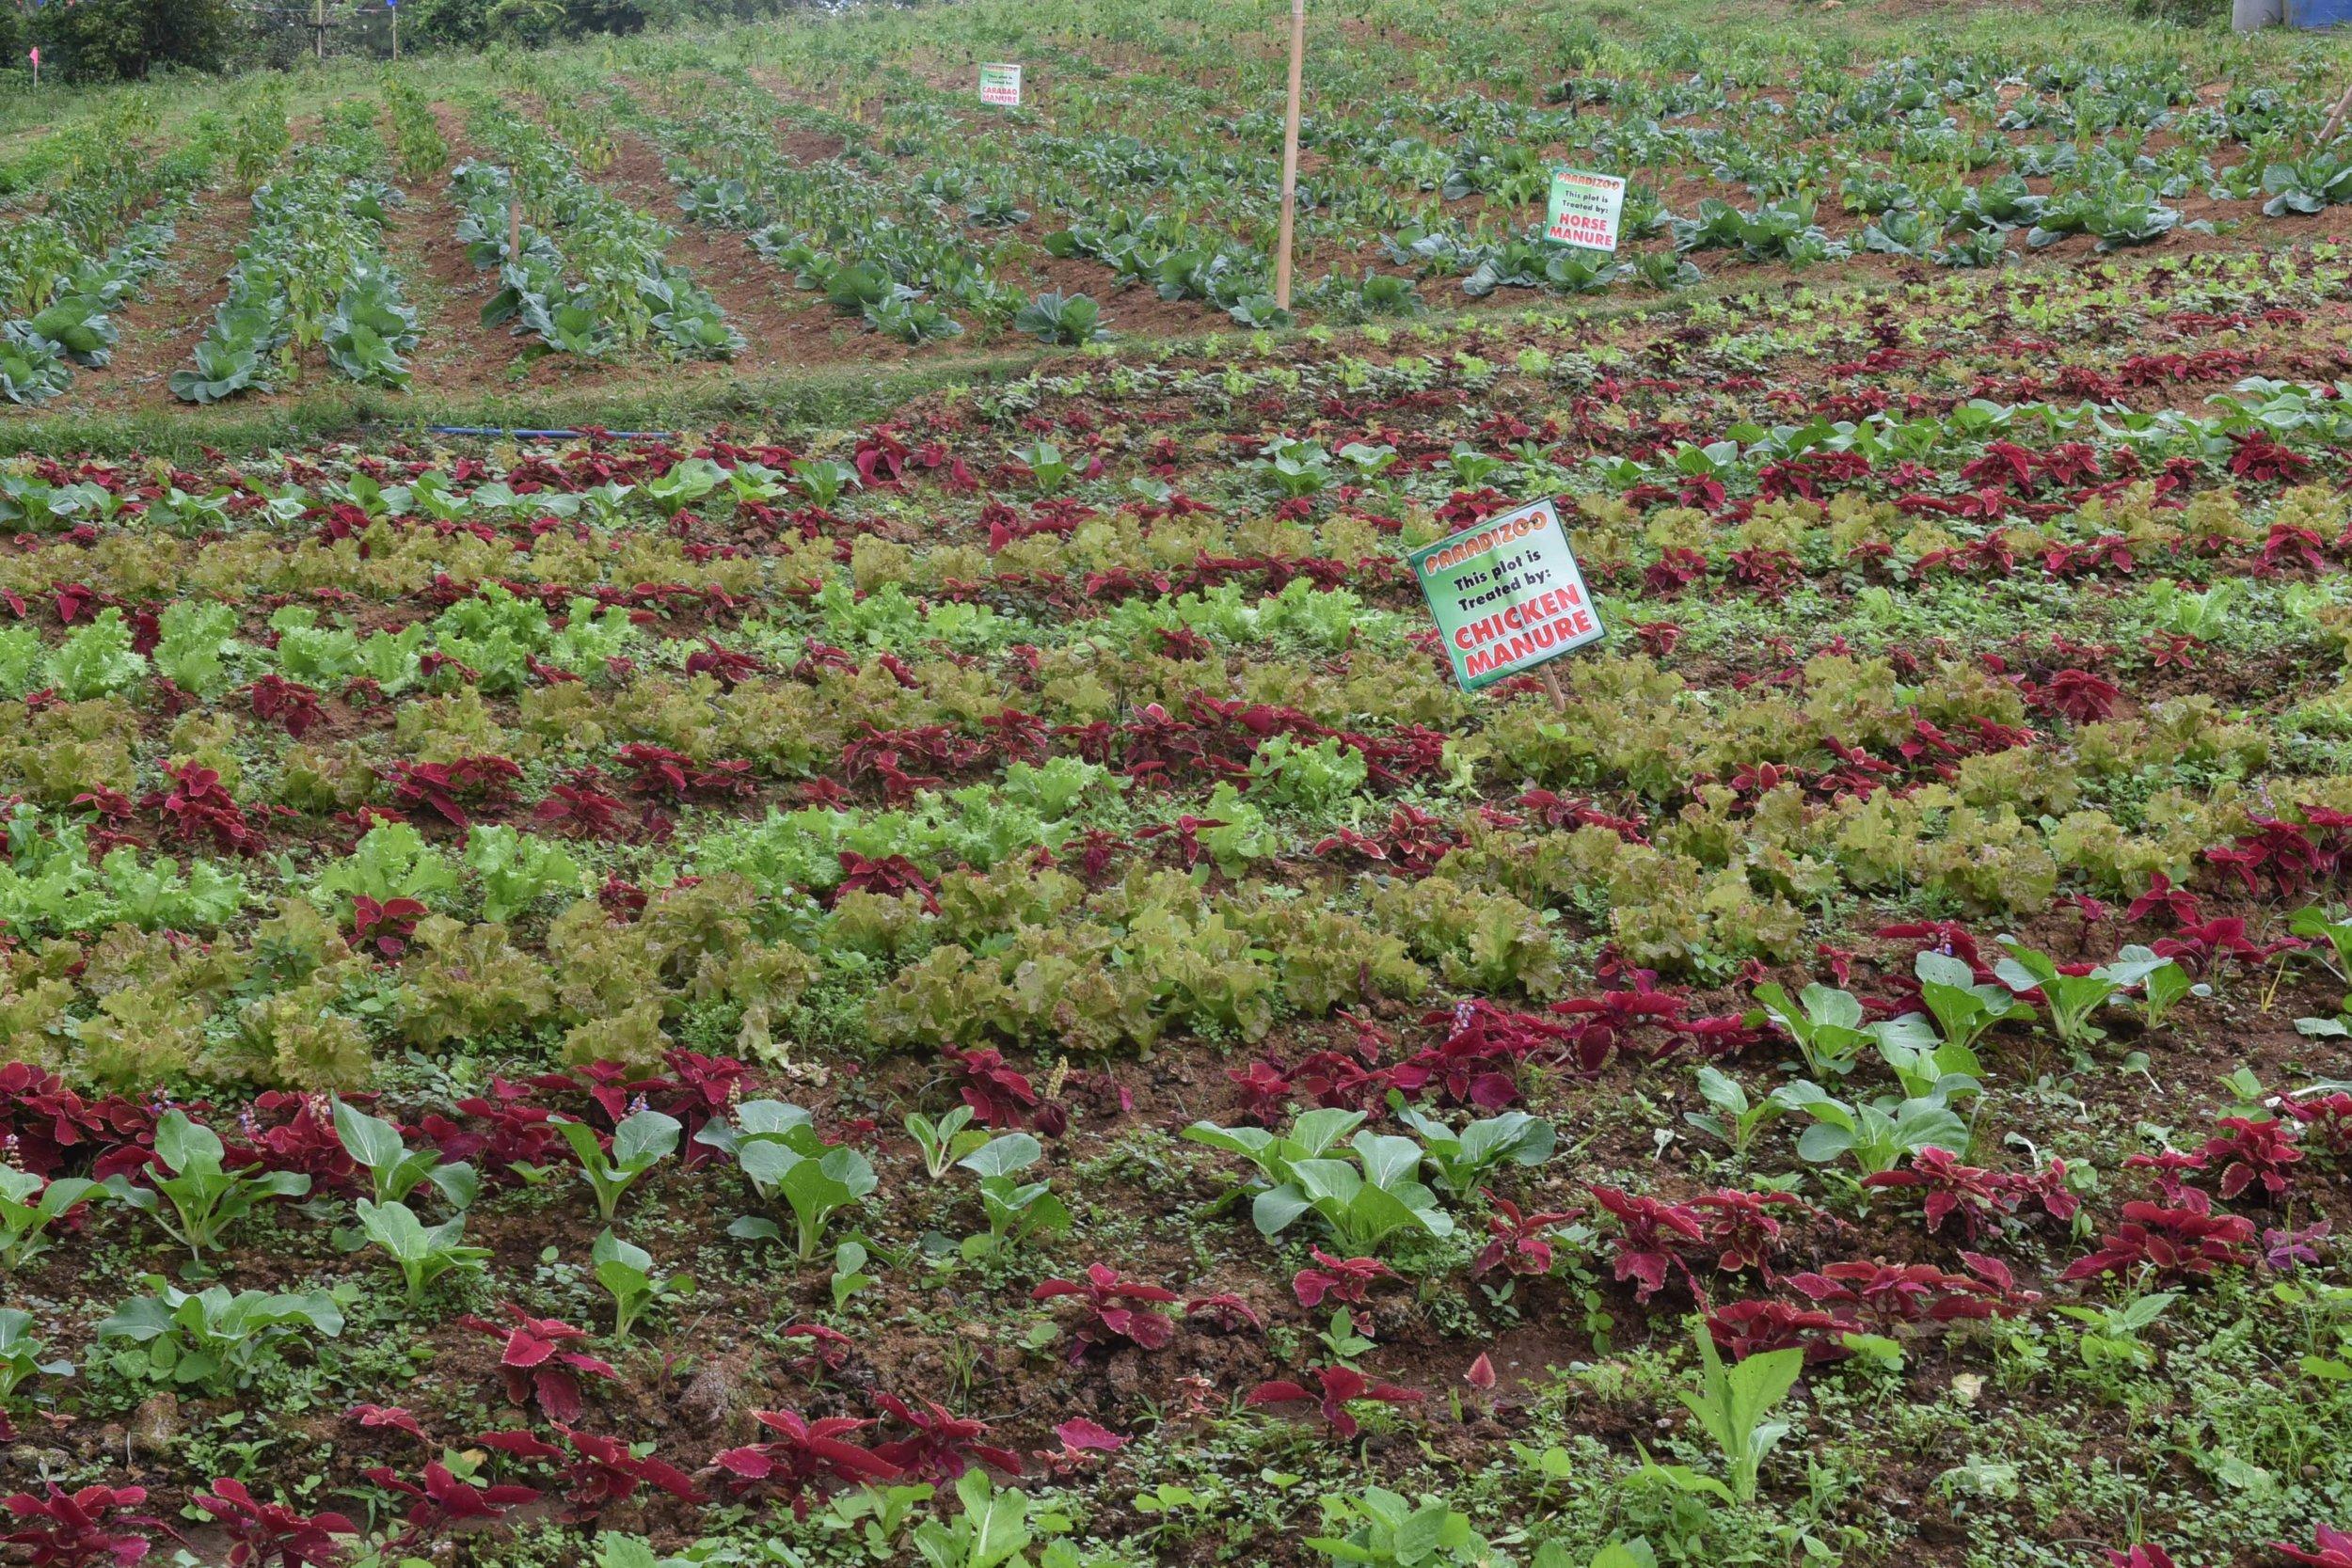 Vegetable garden fertilized by animal manure.